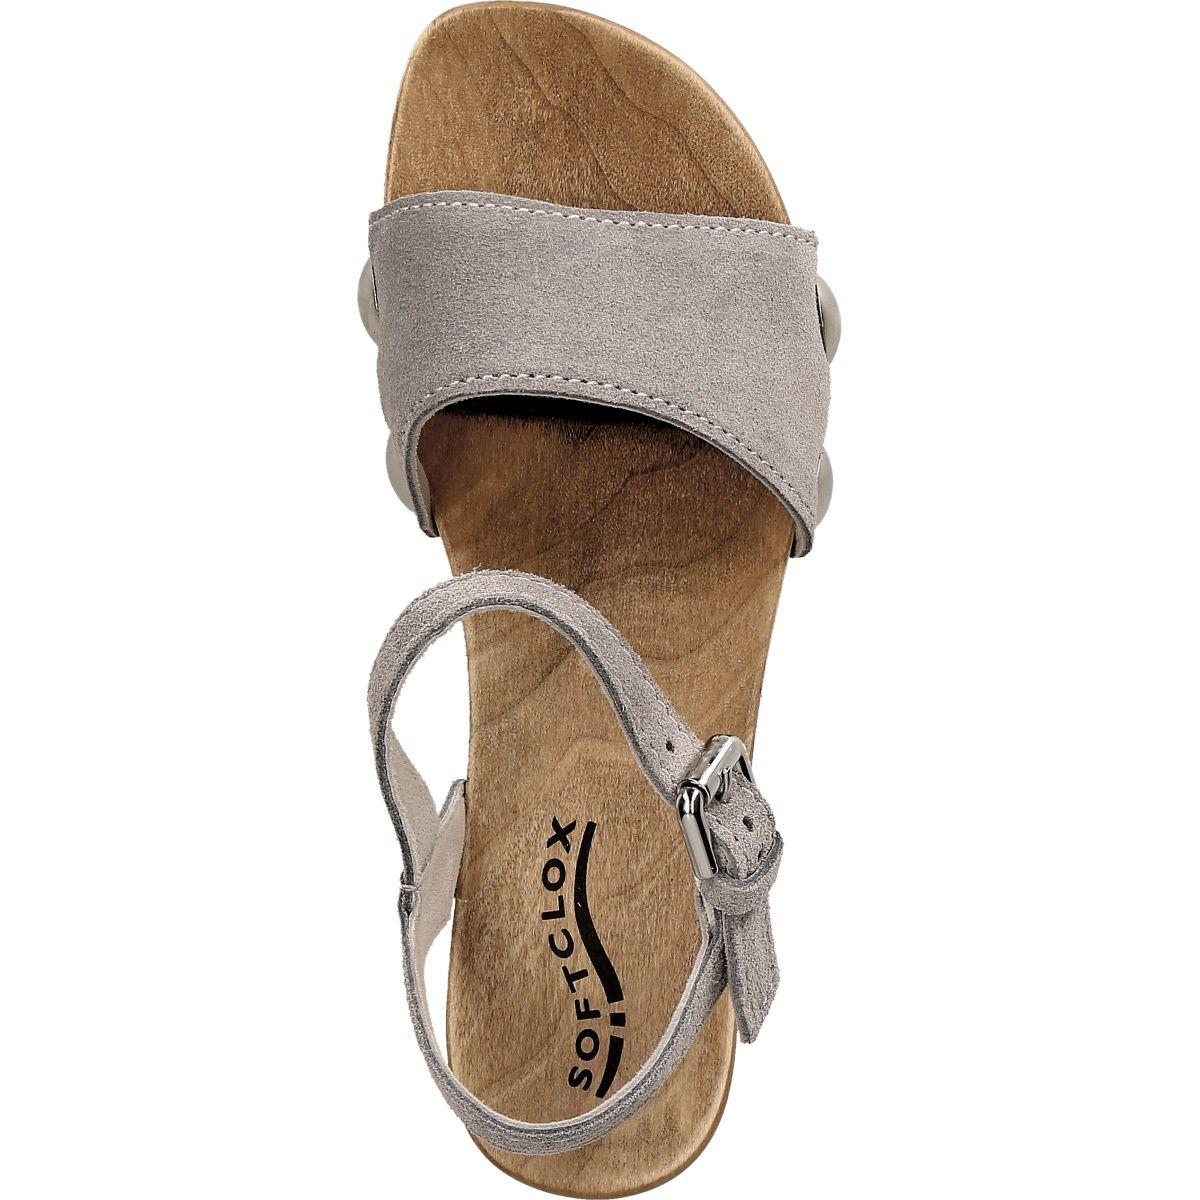 softclox s3378 penny damenschuhe sandaletten im schuhe l ke online shop kaufen. Black Bedroom Furniture Sets. Home Design Ideas